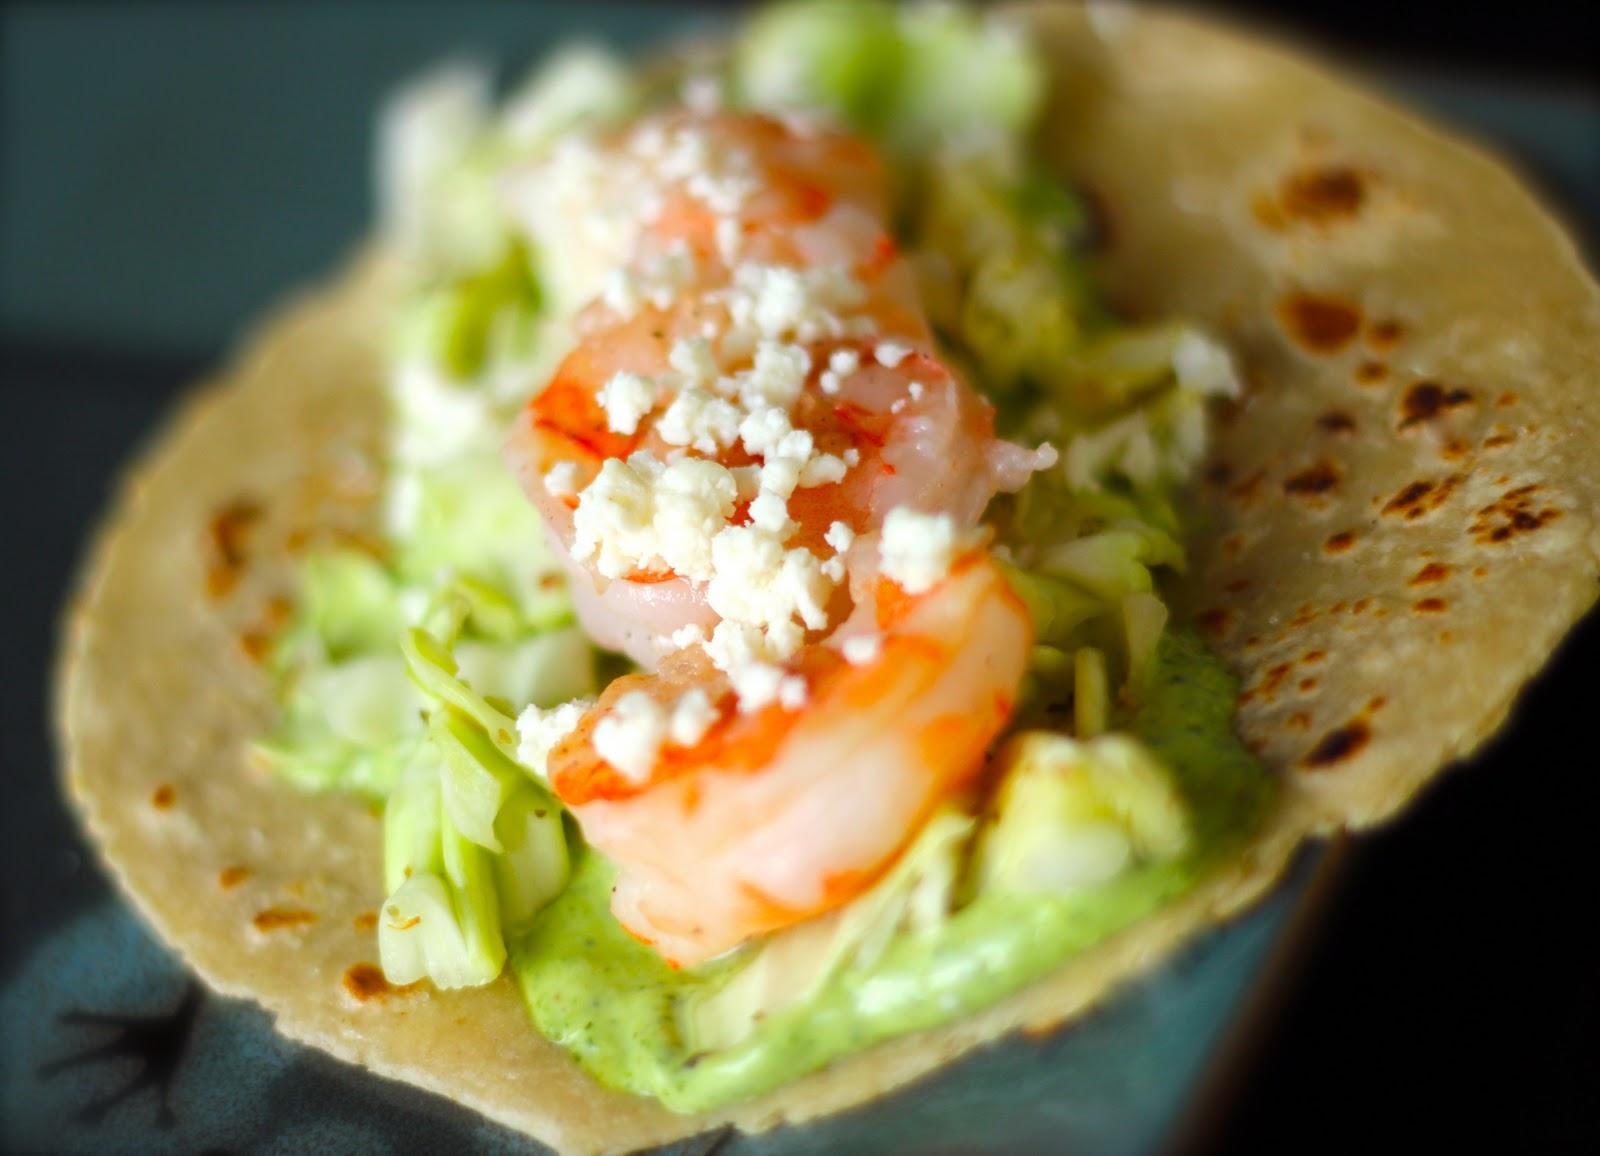 Kristen's Shrimp Tacos -Favorite Family Recipes